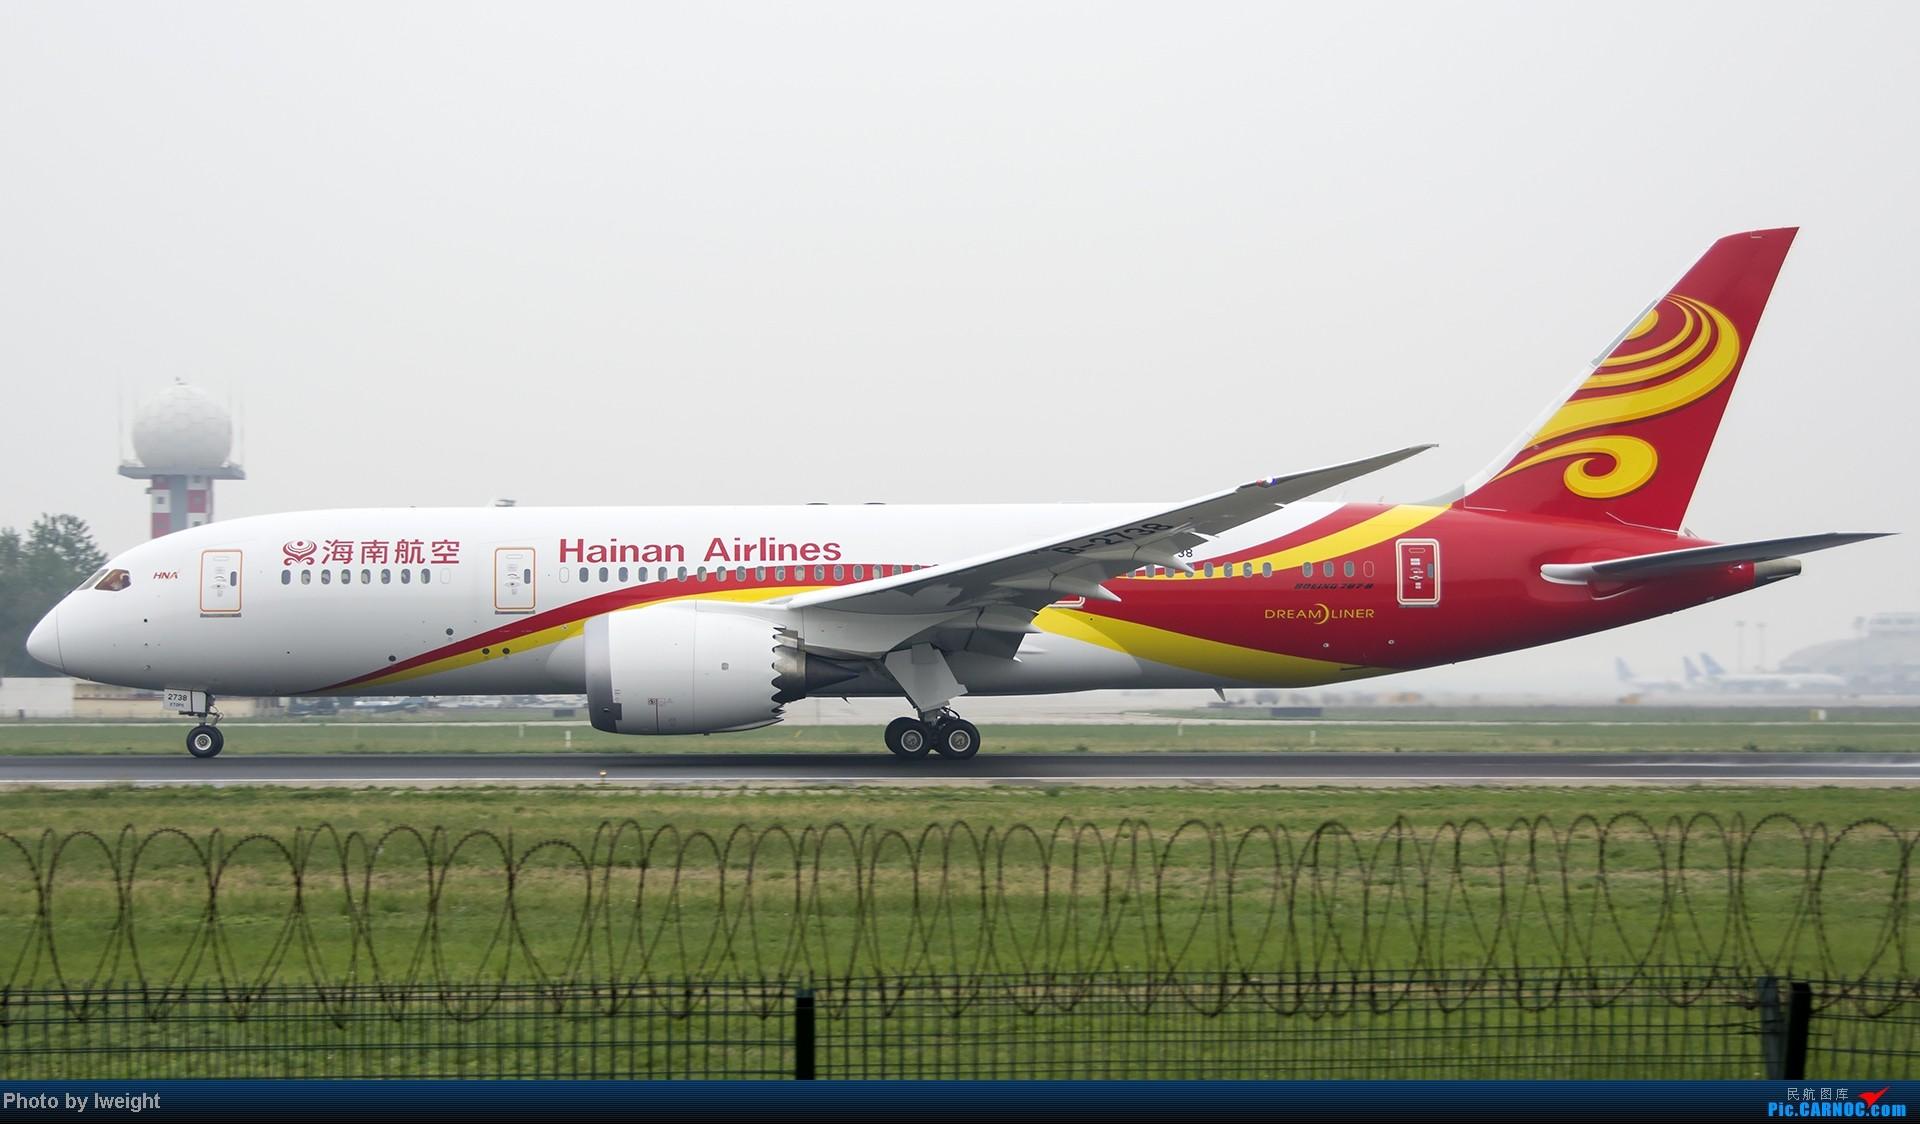 Re:[原创]休假无聊,跑道边来拍机玩(晚点的ZestAir、换装的B6100和刚交付的B2738等) BOEING 787-8 B-2738 中国北京首都机场